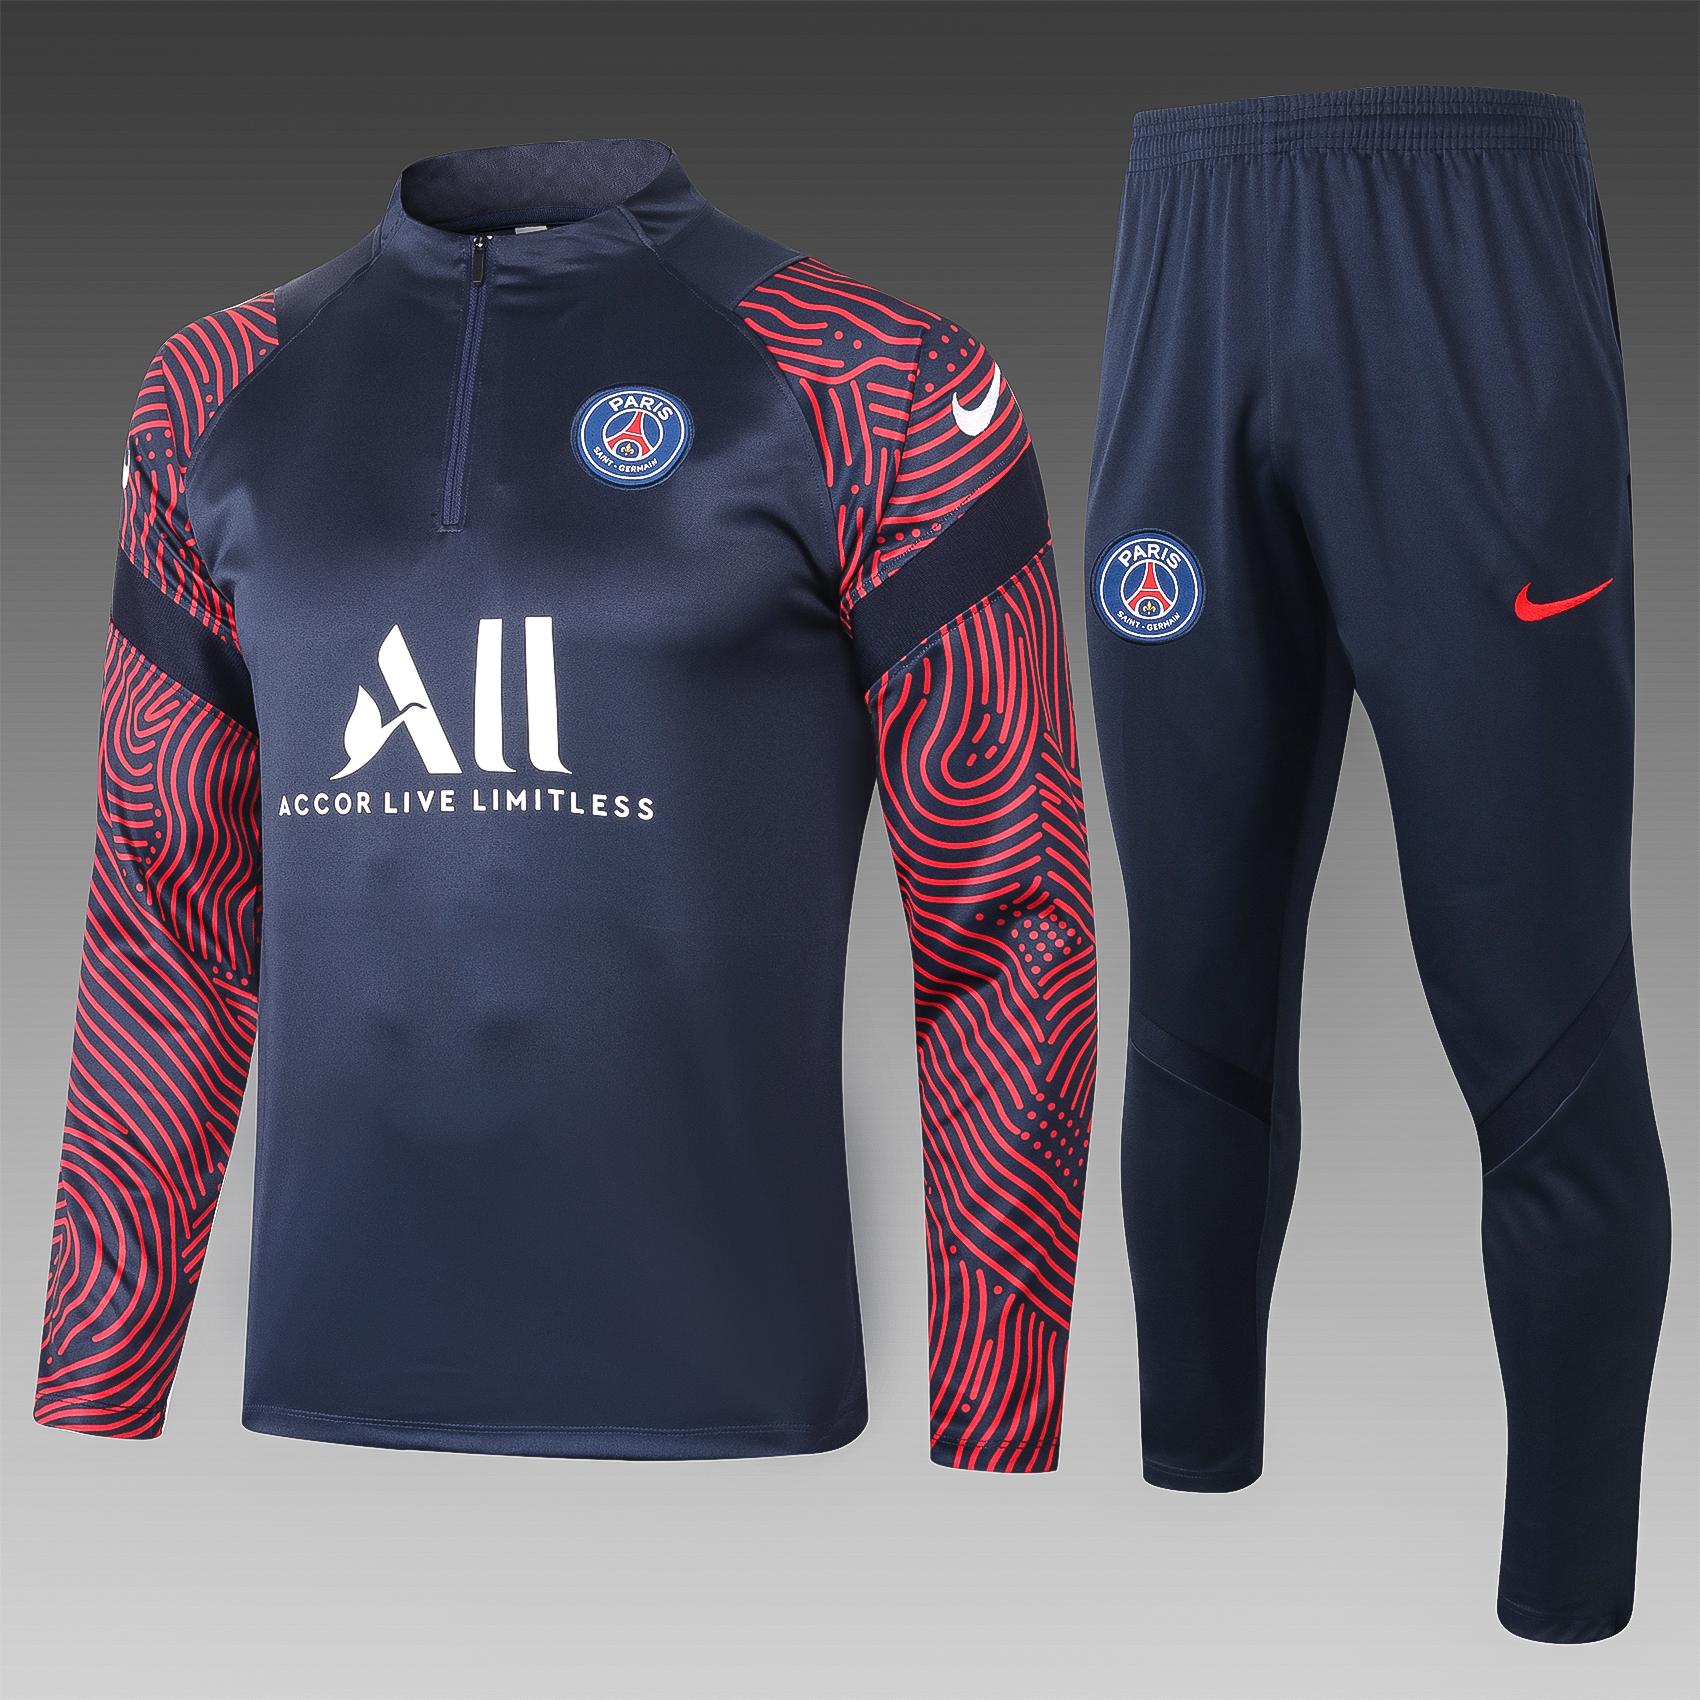 Training PSG saison 2020-2021